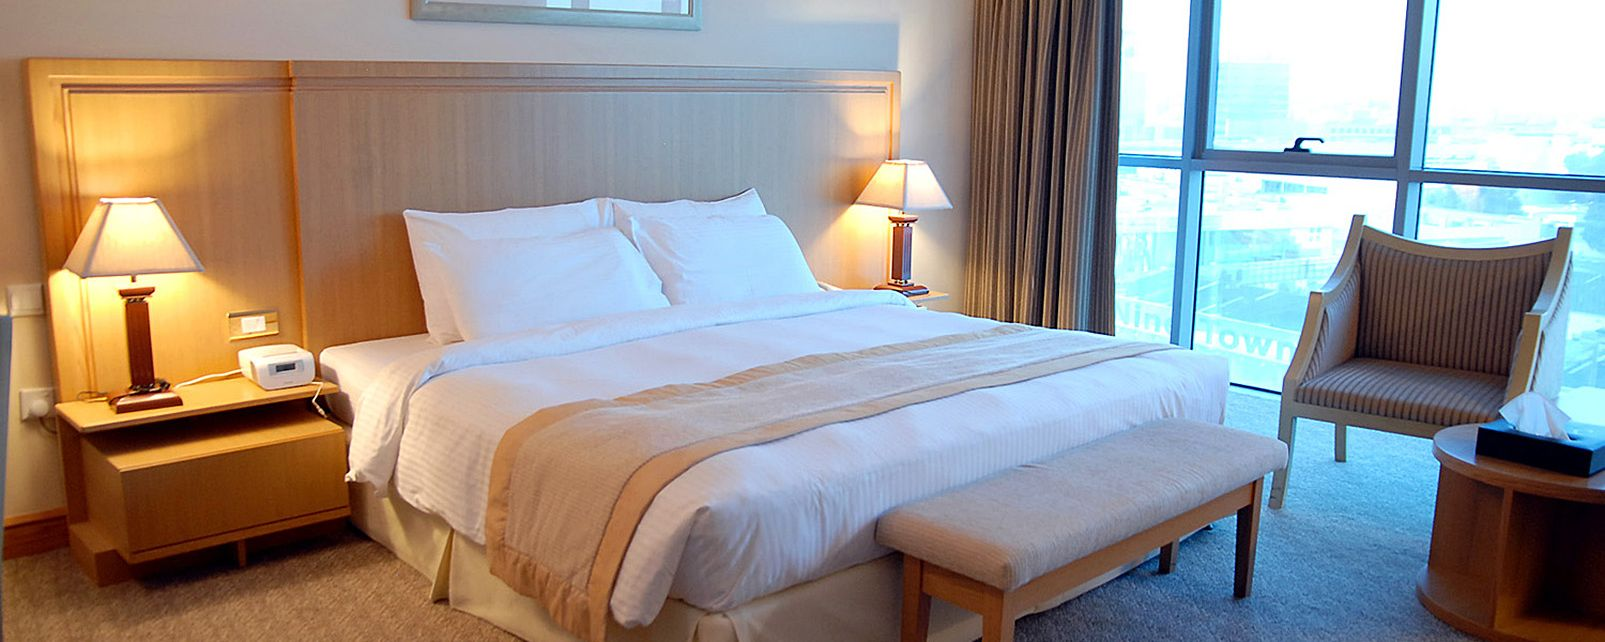 Hôtel City Seasons Hotel